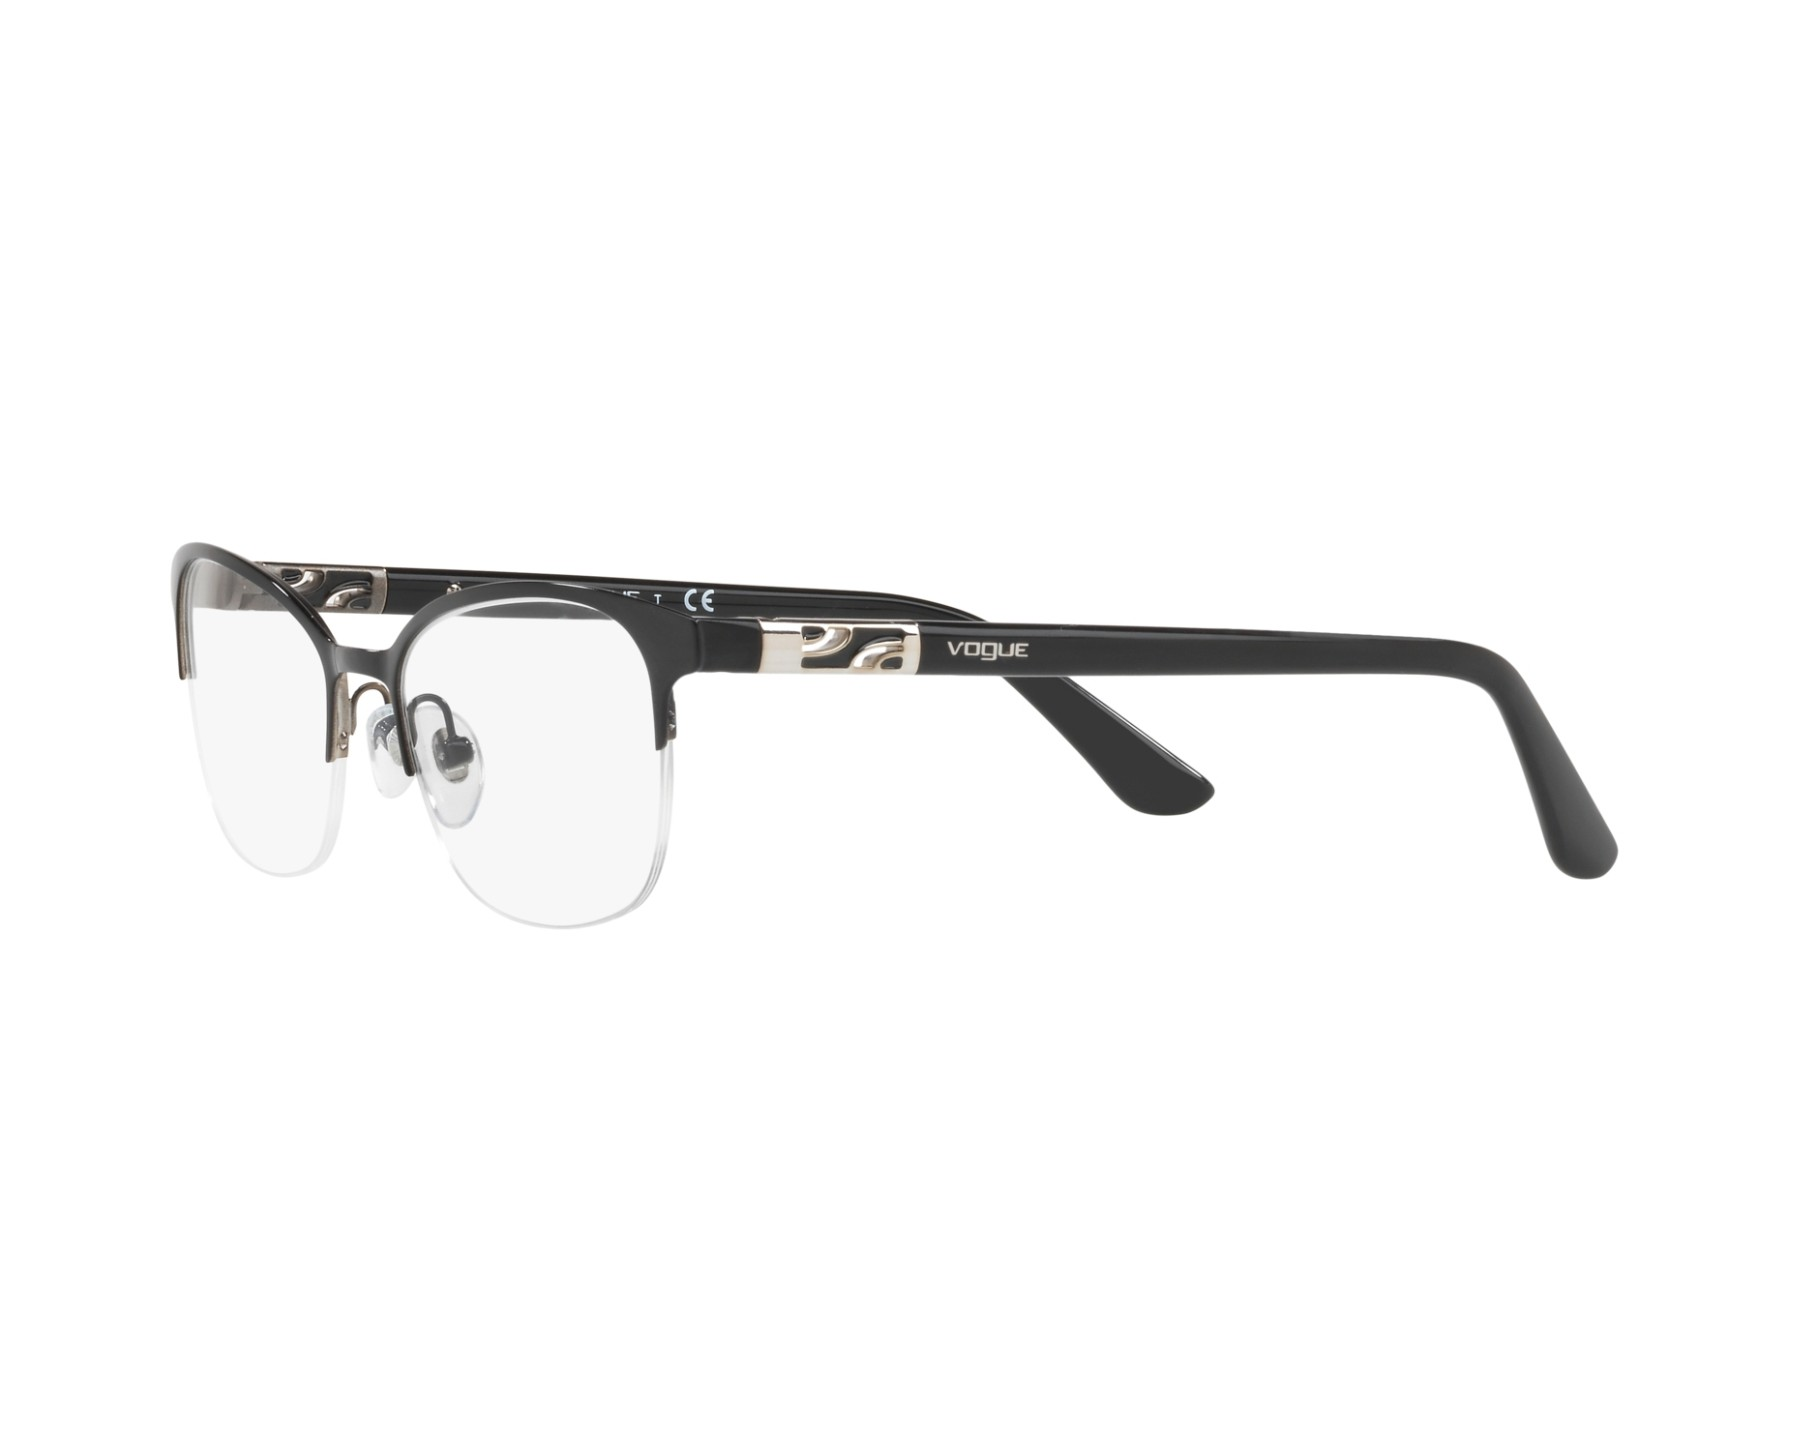 856ee6c90f eyeglasses Vogue VO-4067 352 - Black Silver 360 degree view 3